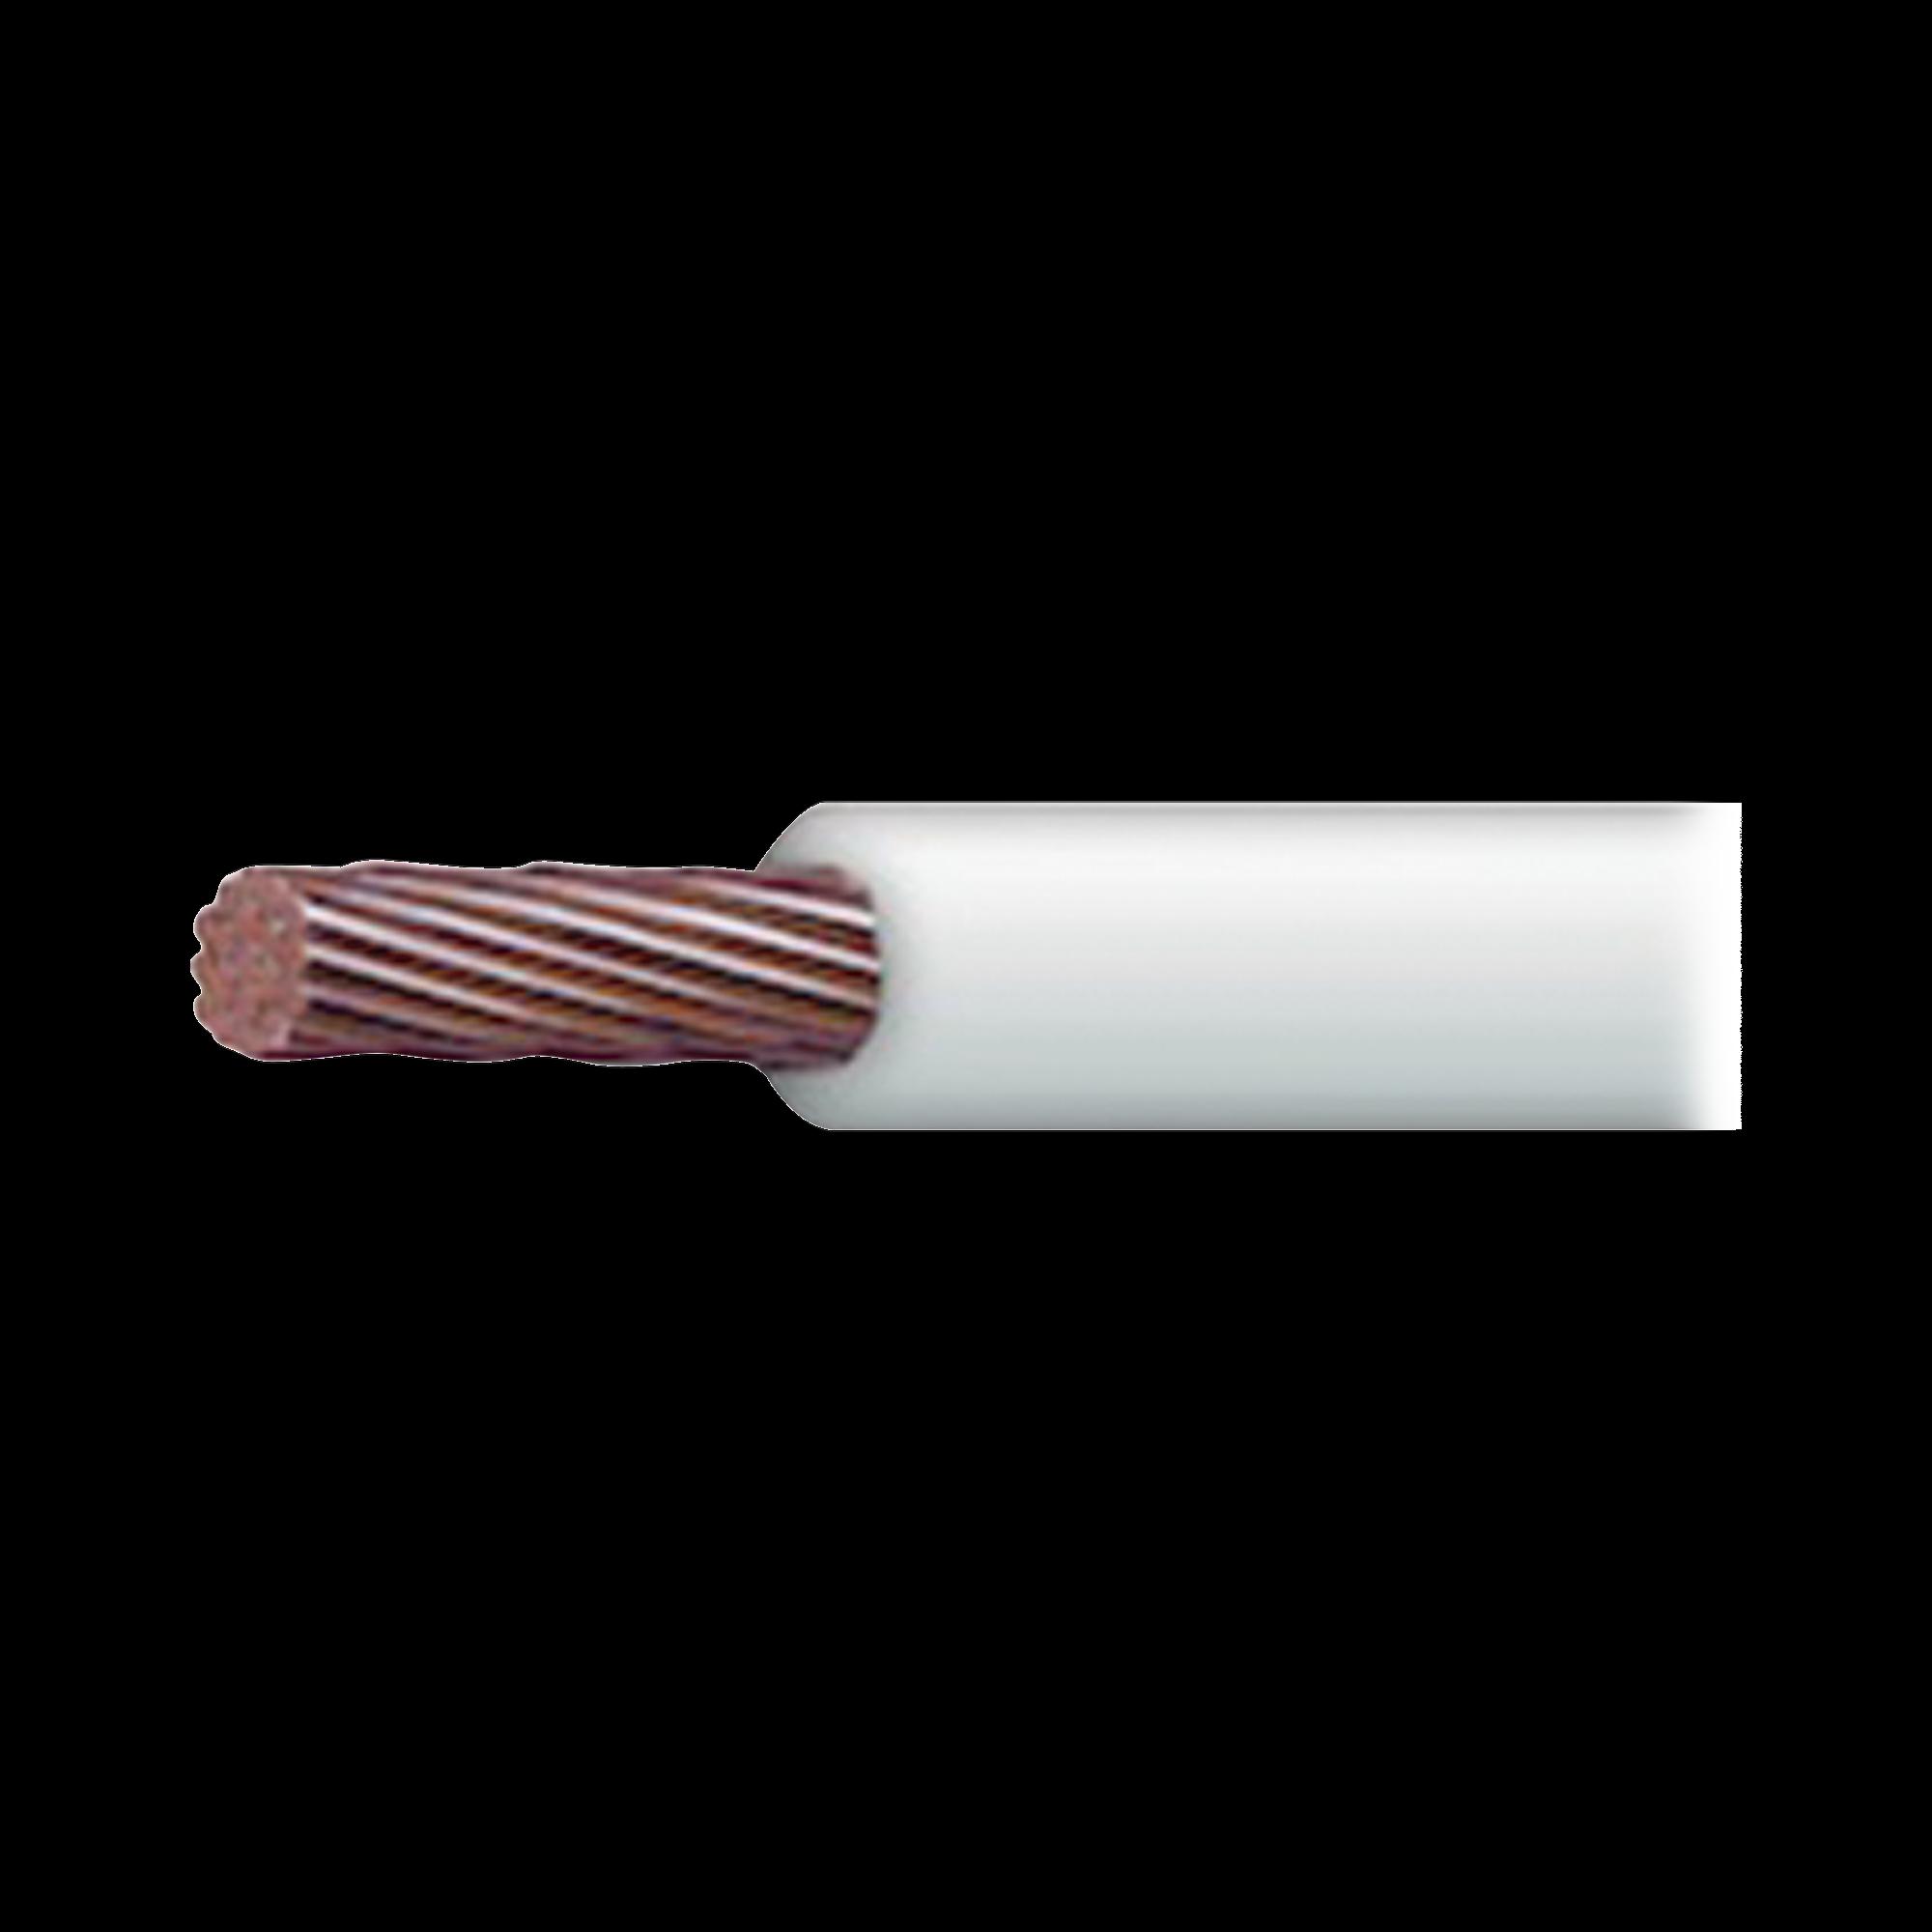 Cable 18 awg  color blanco, Conductor de cobre suave. Aislamiento de PVC, auto-extinguible. BOBINA de 100 MTS